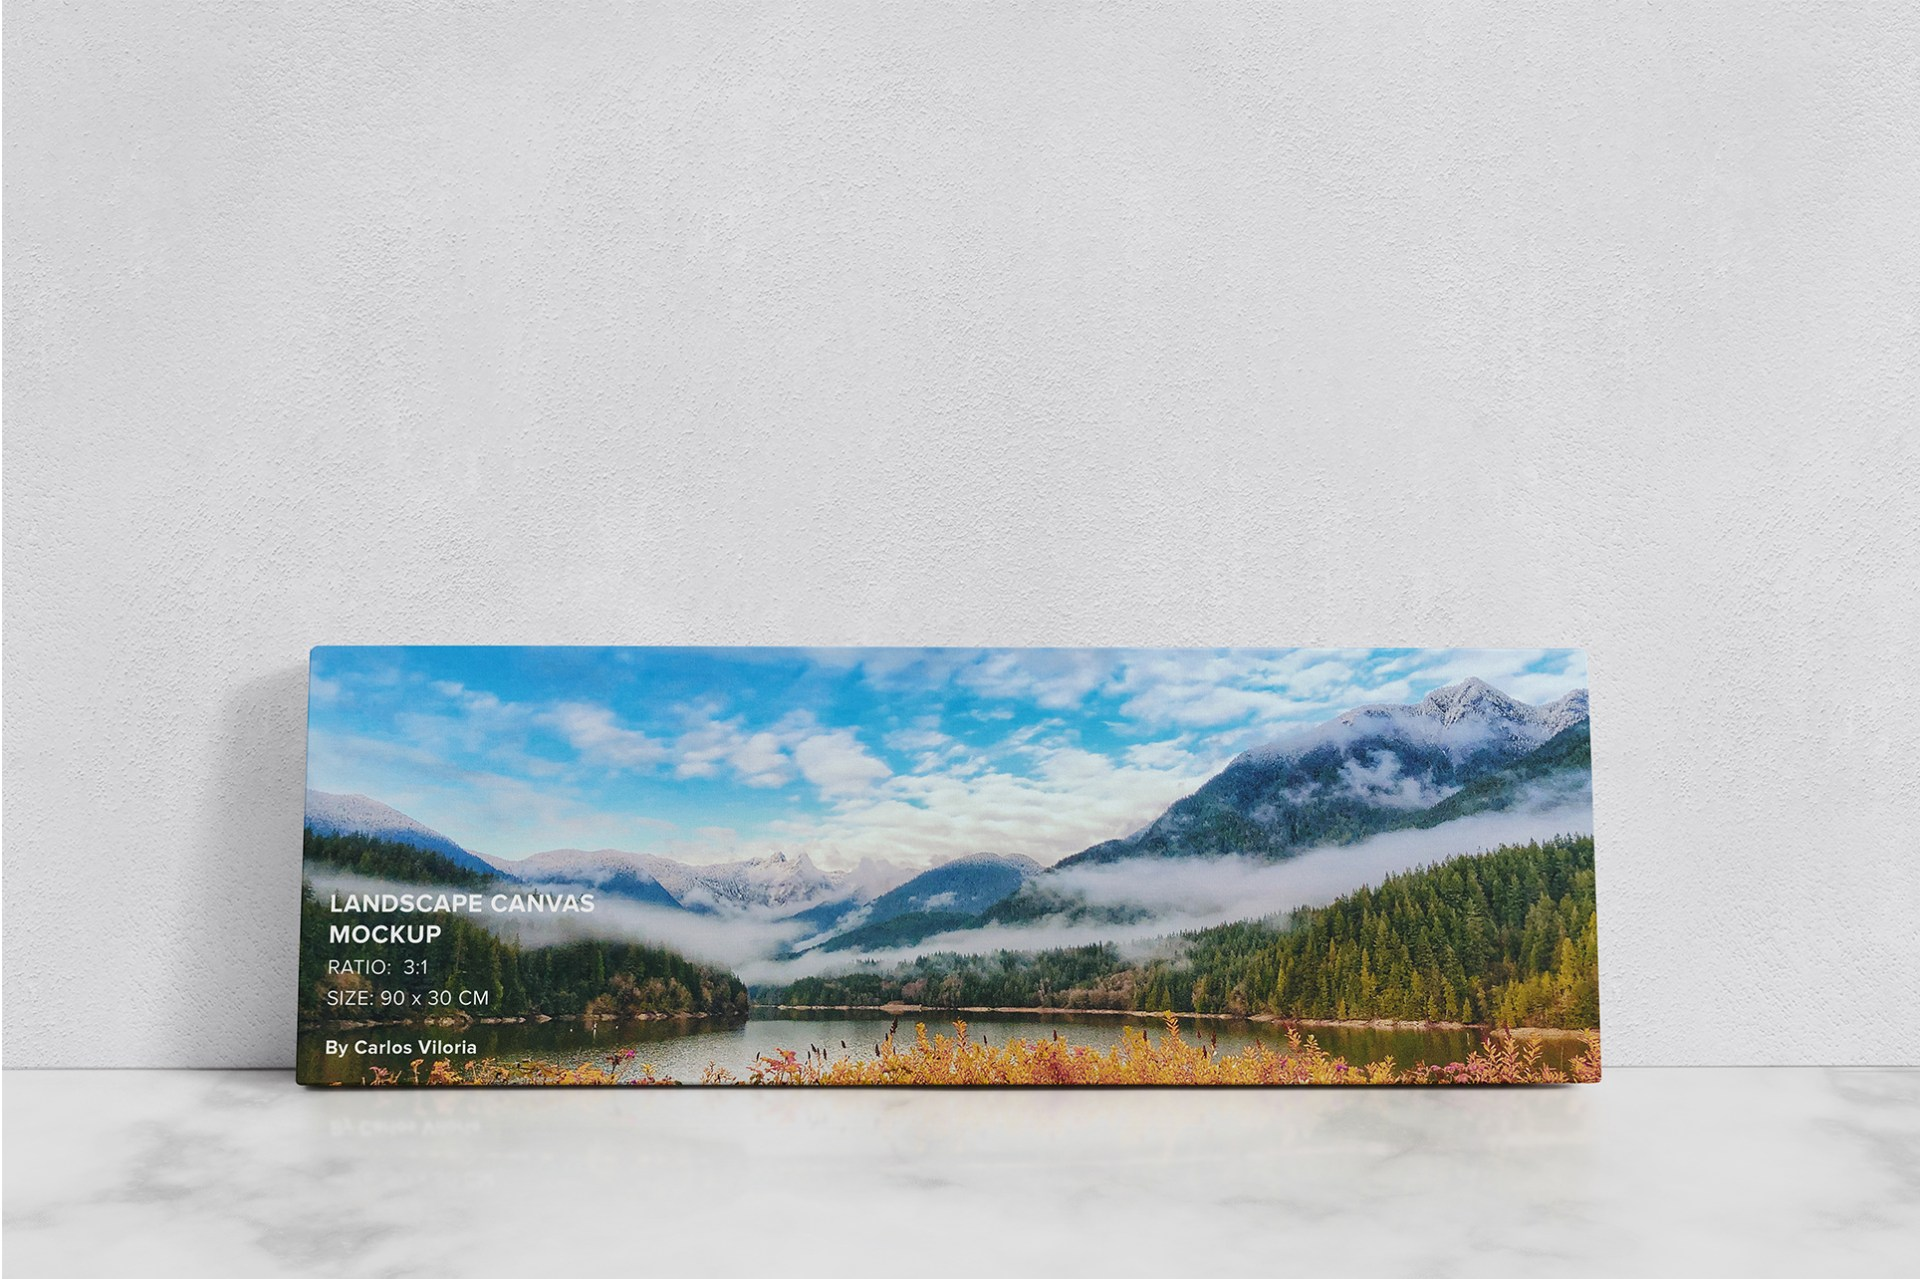 Art Wall Landscape Canvas Mockup